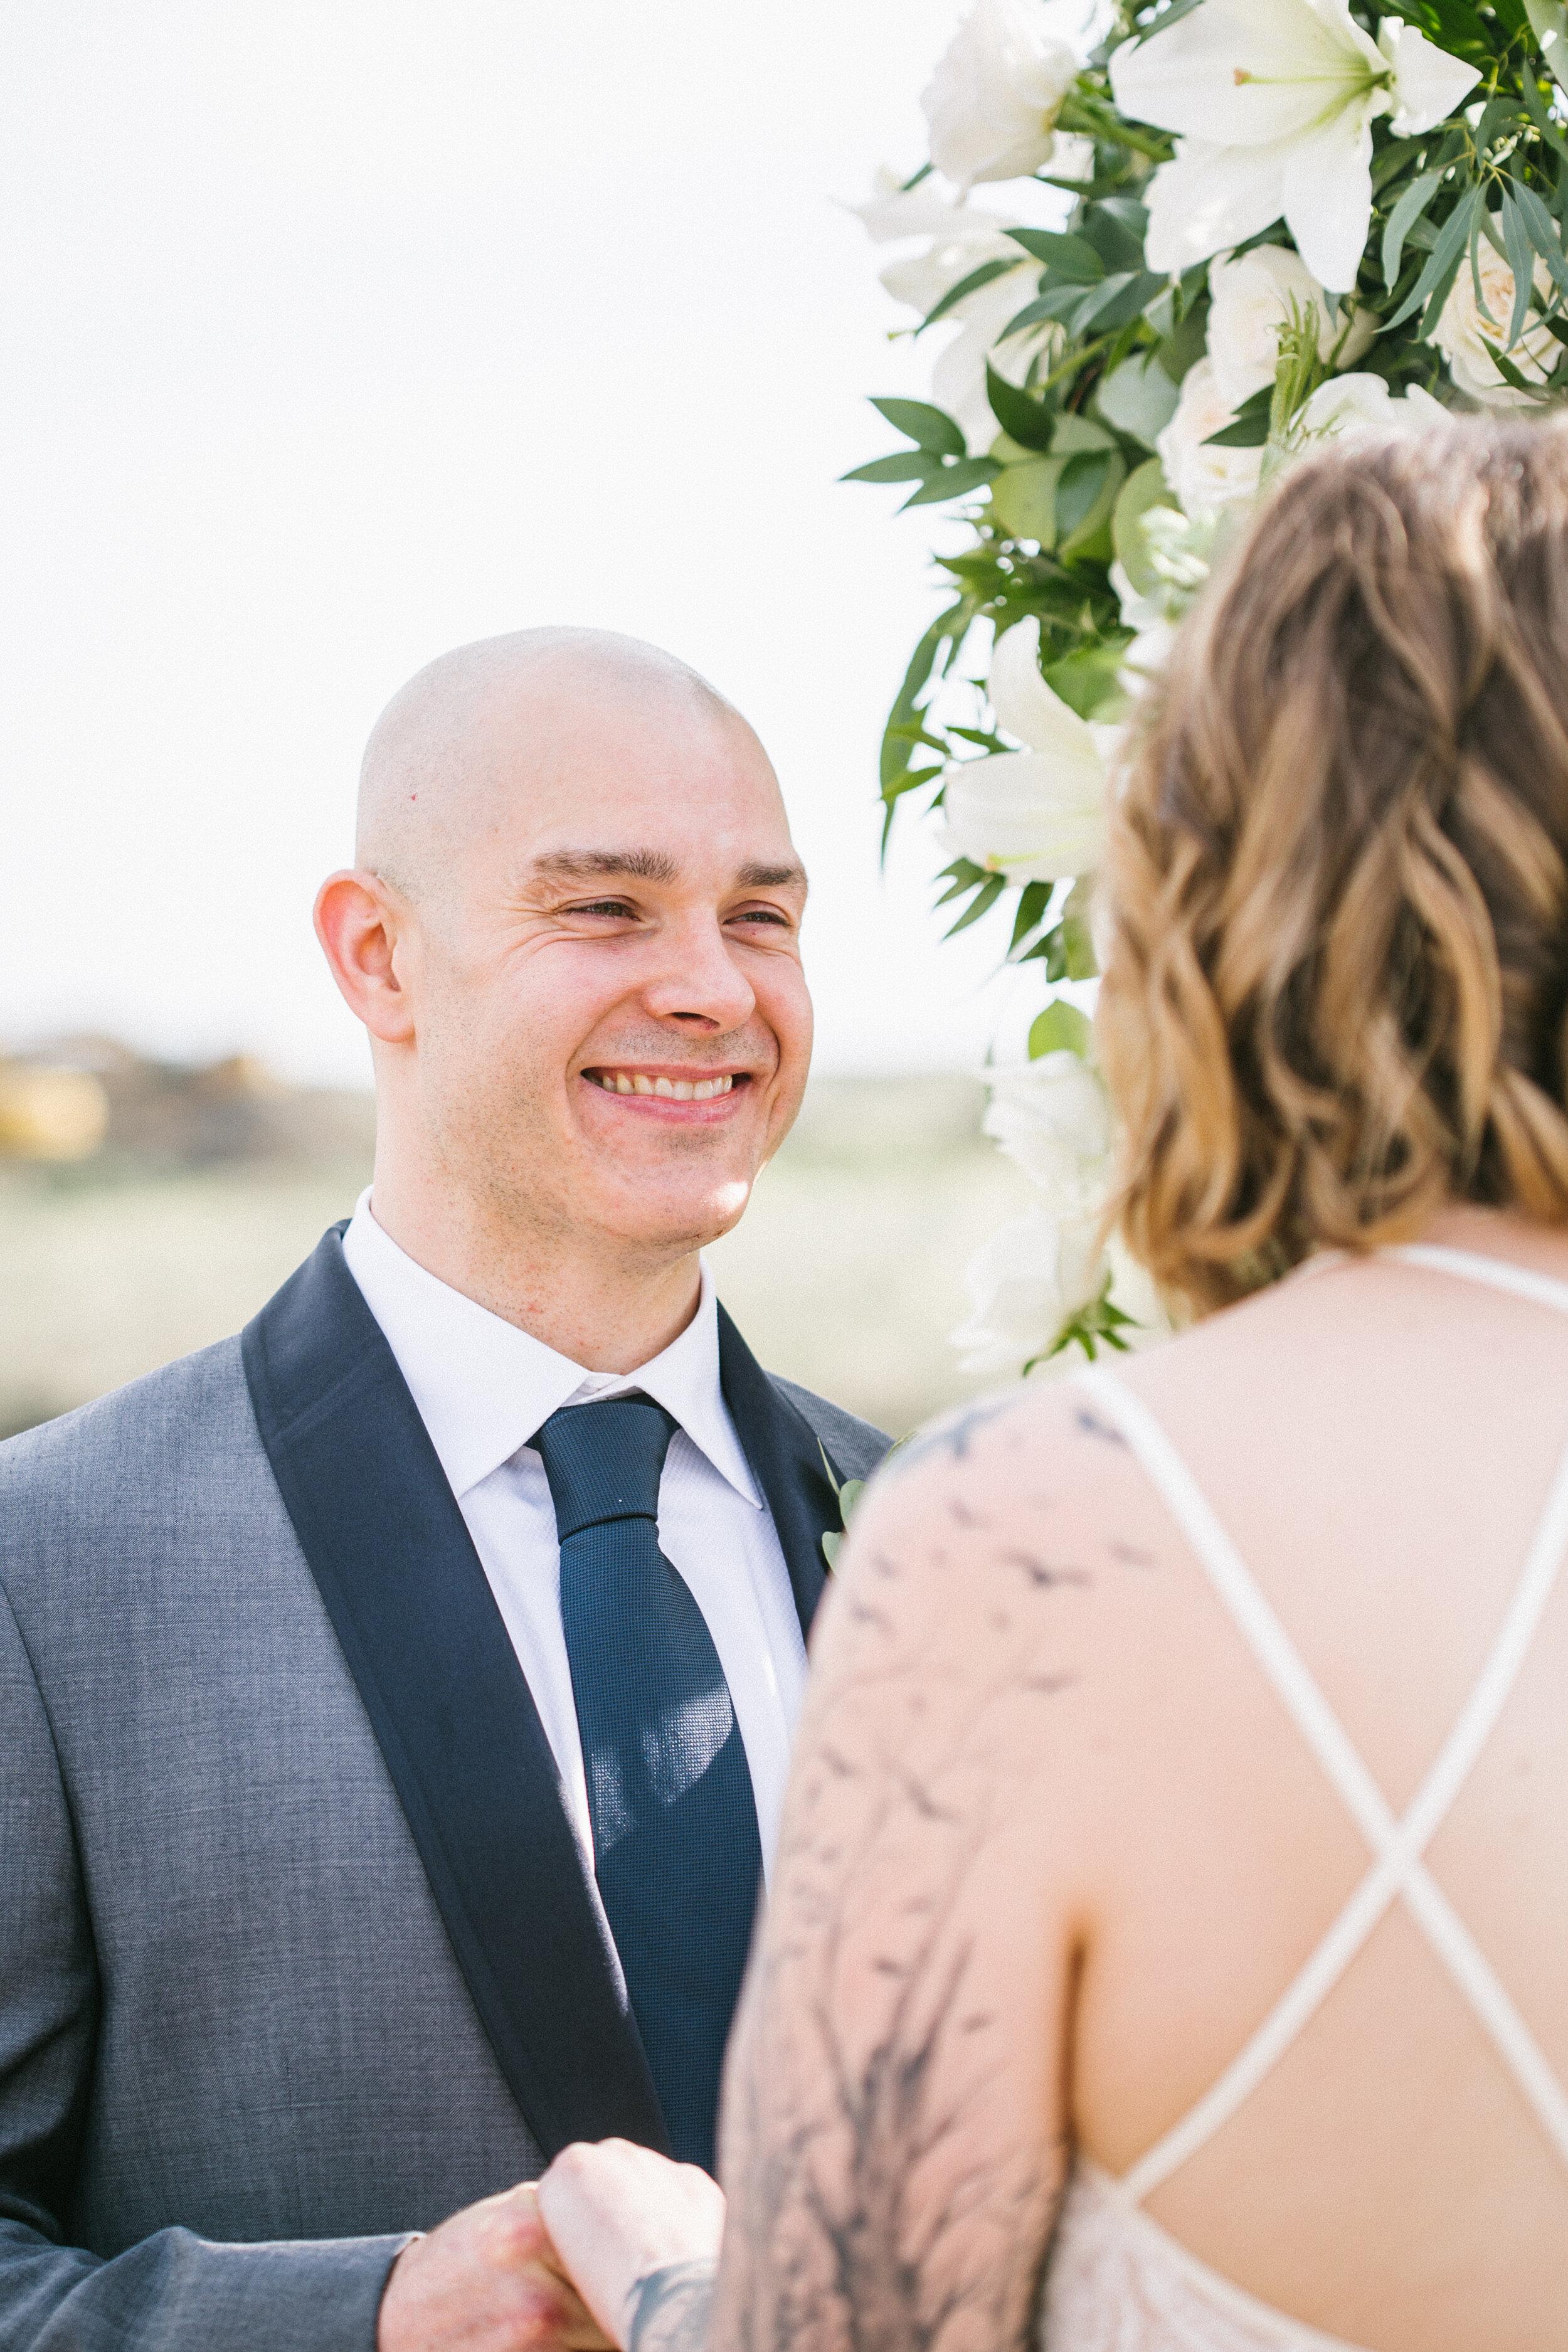 Sublime Stems | Cave B Inn | Fuck Yeah Weddings | Angela and Evan Photography